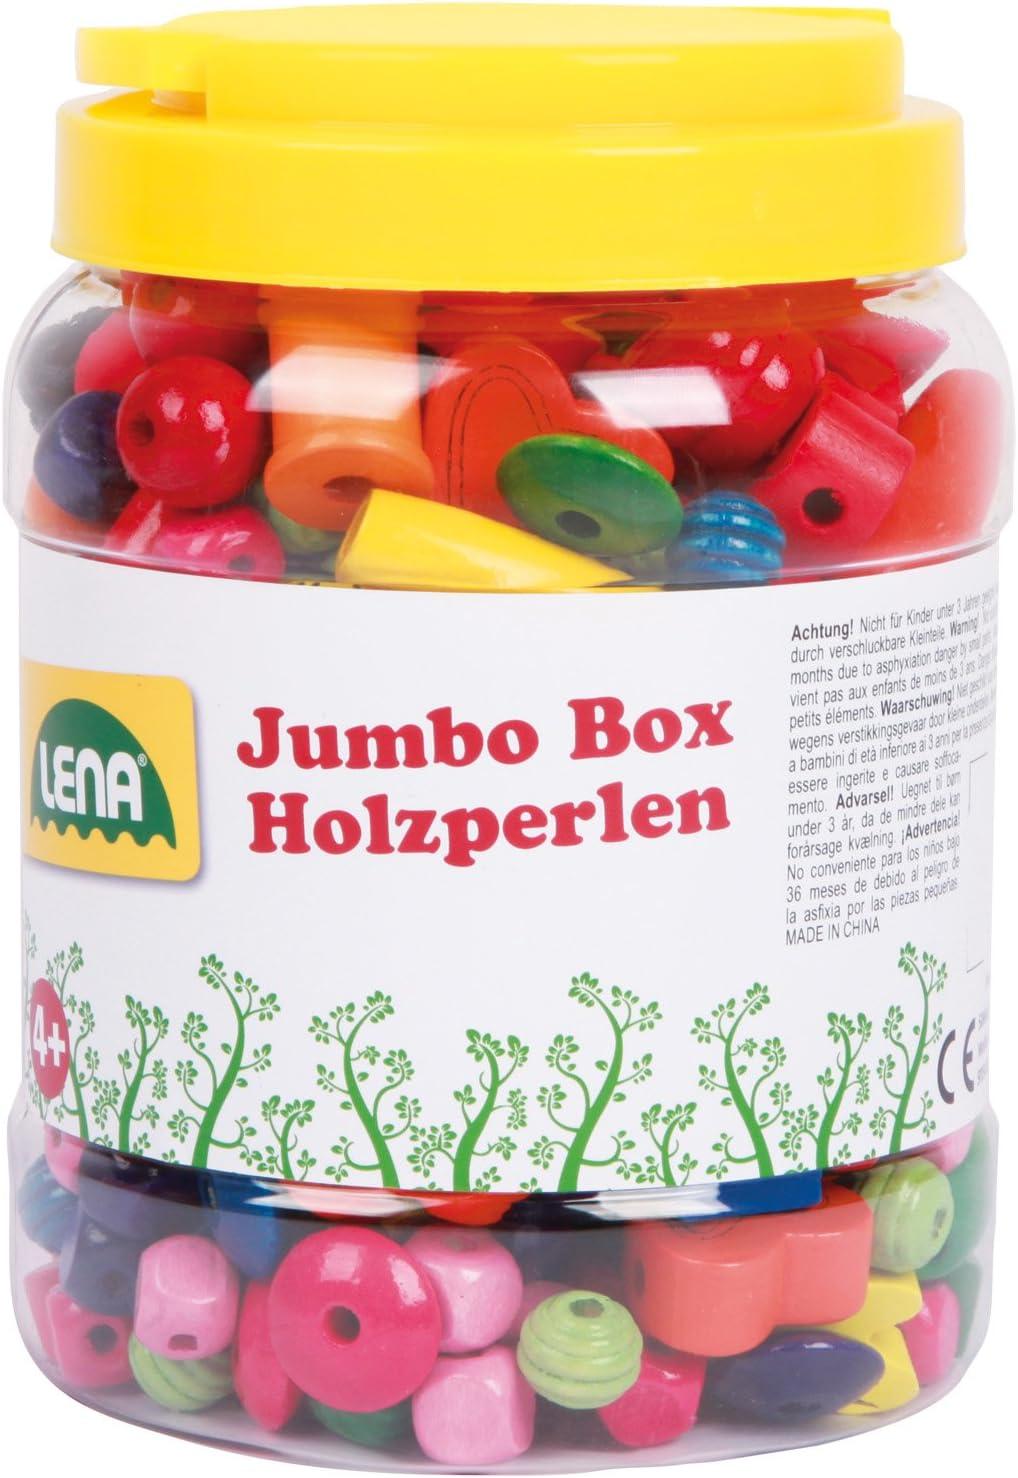 Jumbo Box Holzperlen Lena 32044 gestalte schöne Ketten